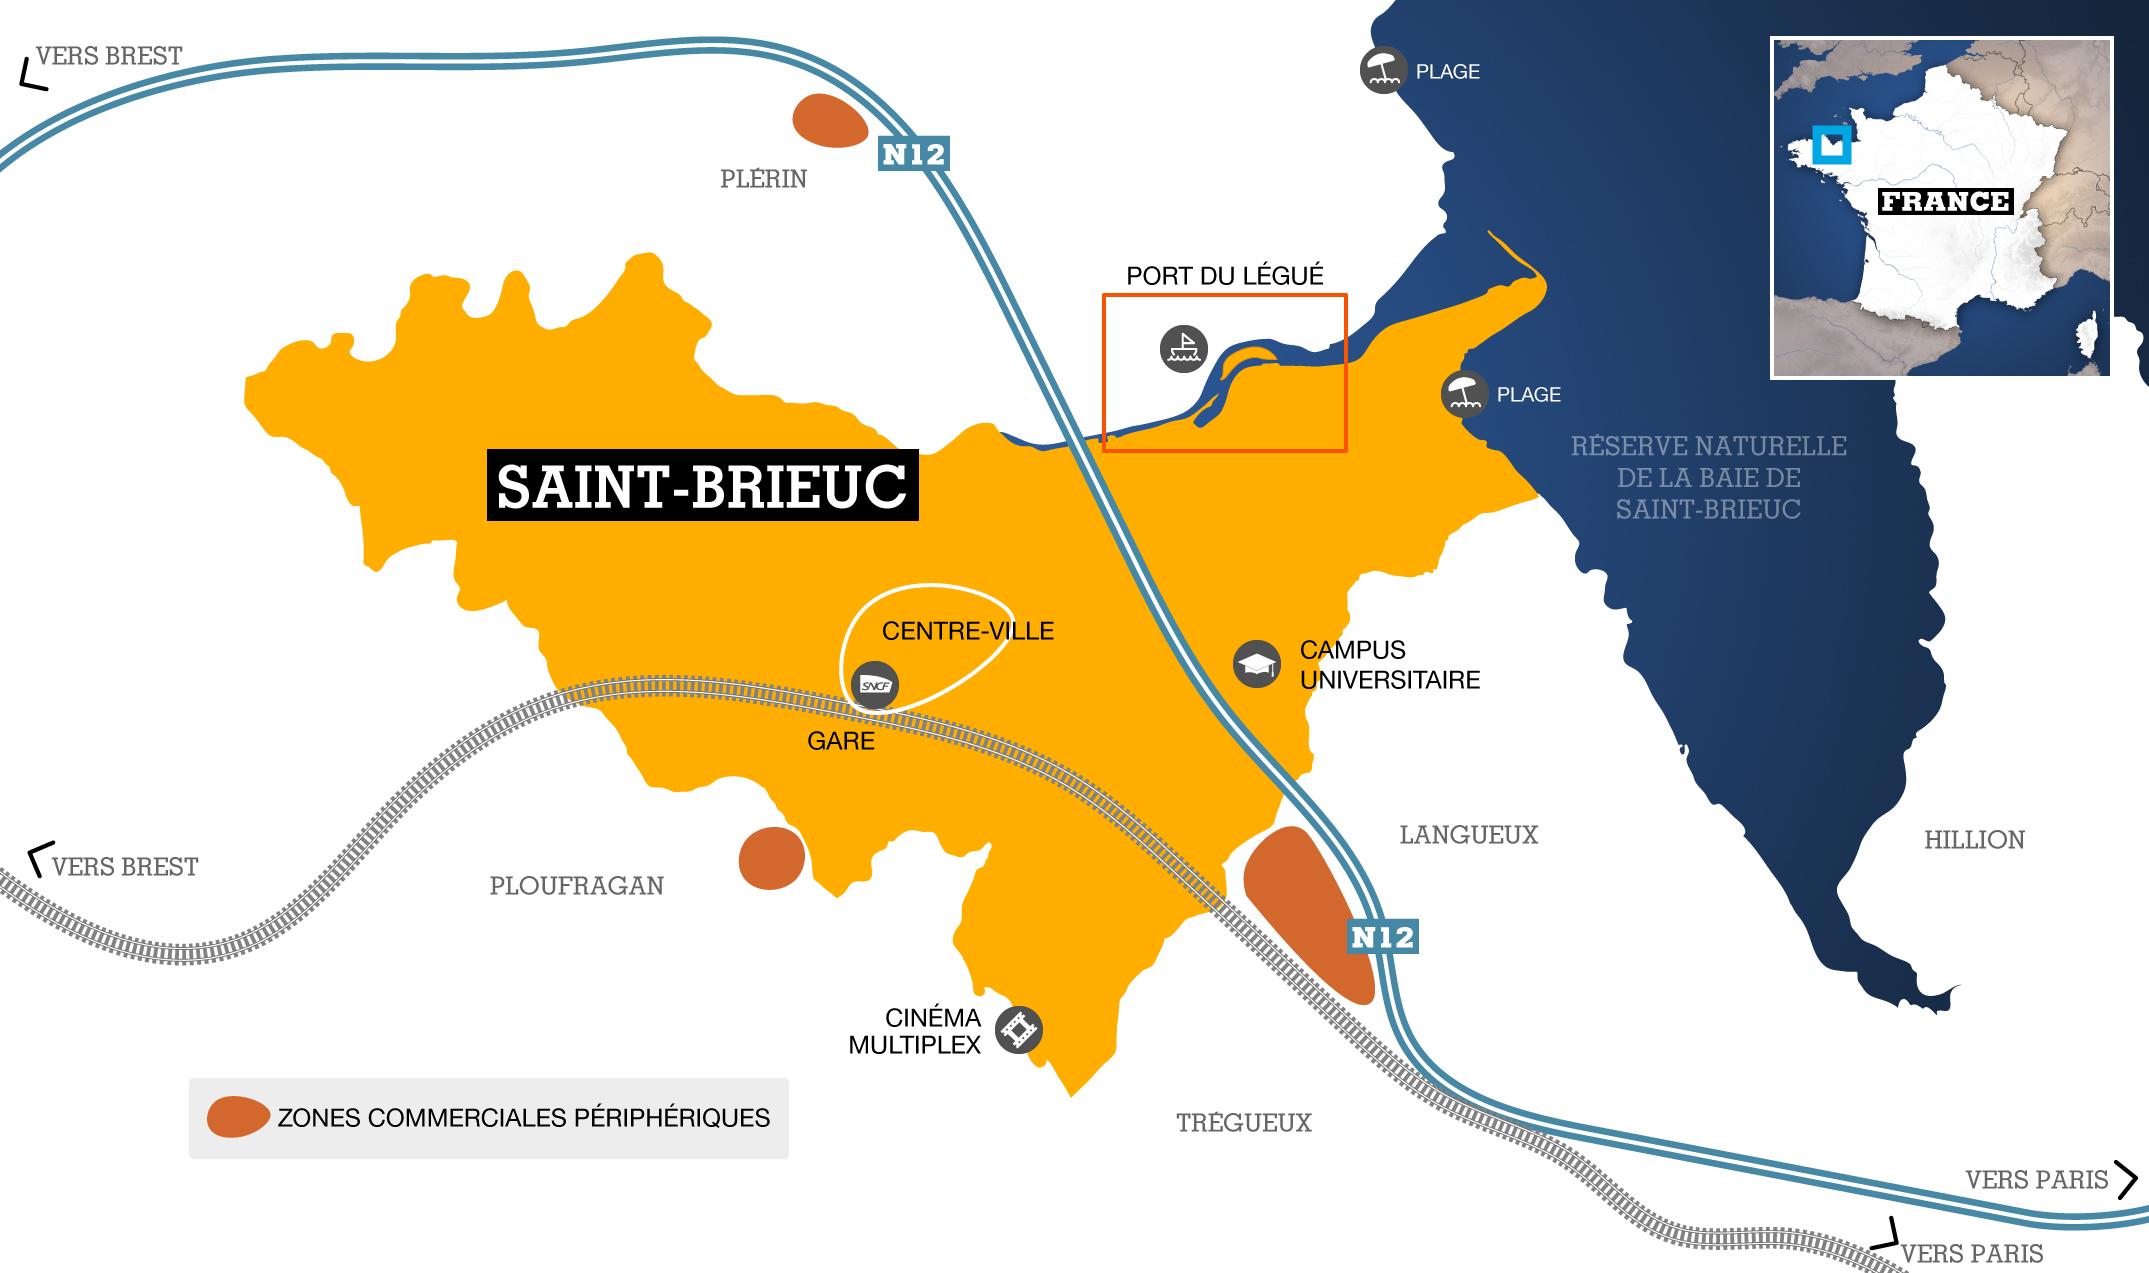 Etude de Saint-Brieuc - Blog de classeprepa72 et terminal72  |Saint Brieuc Carte